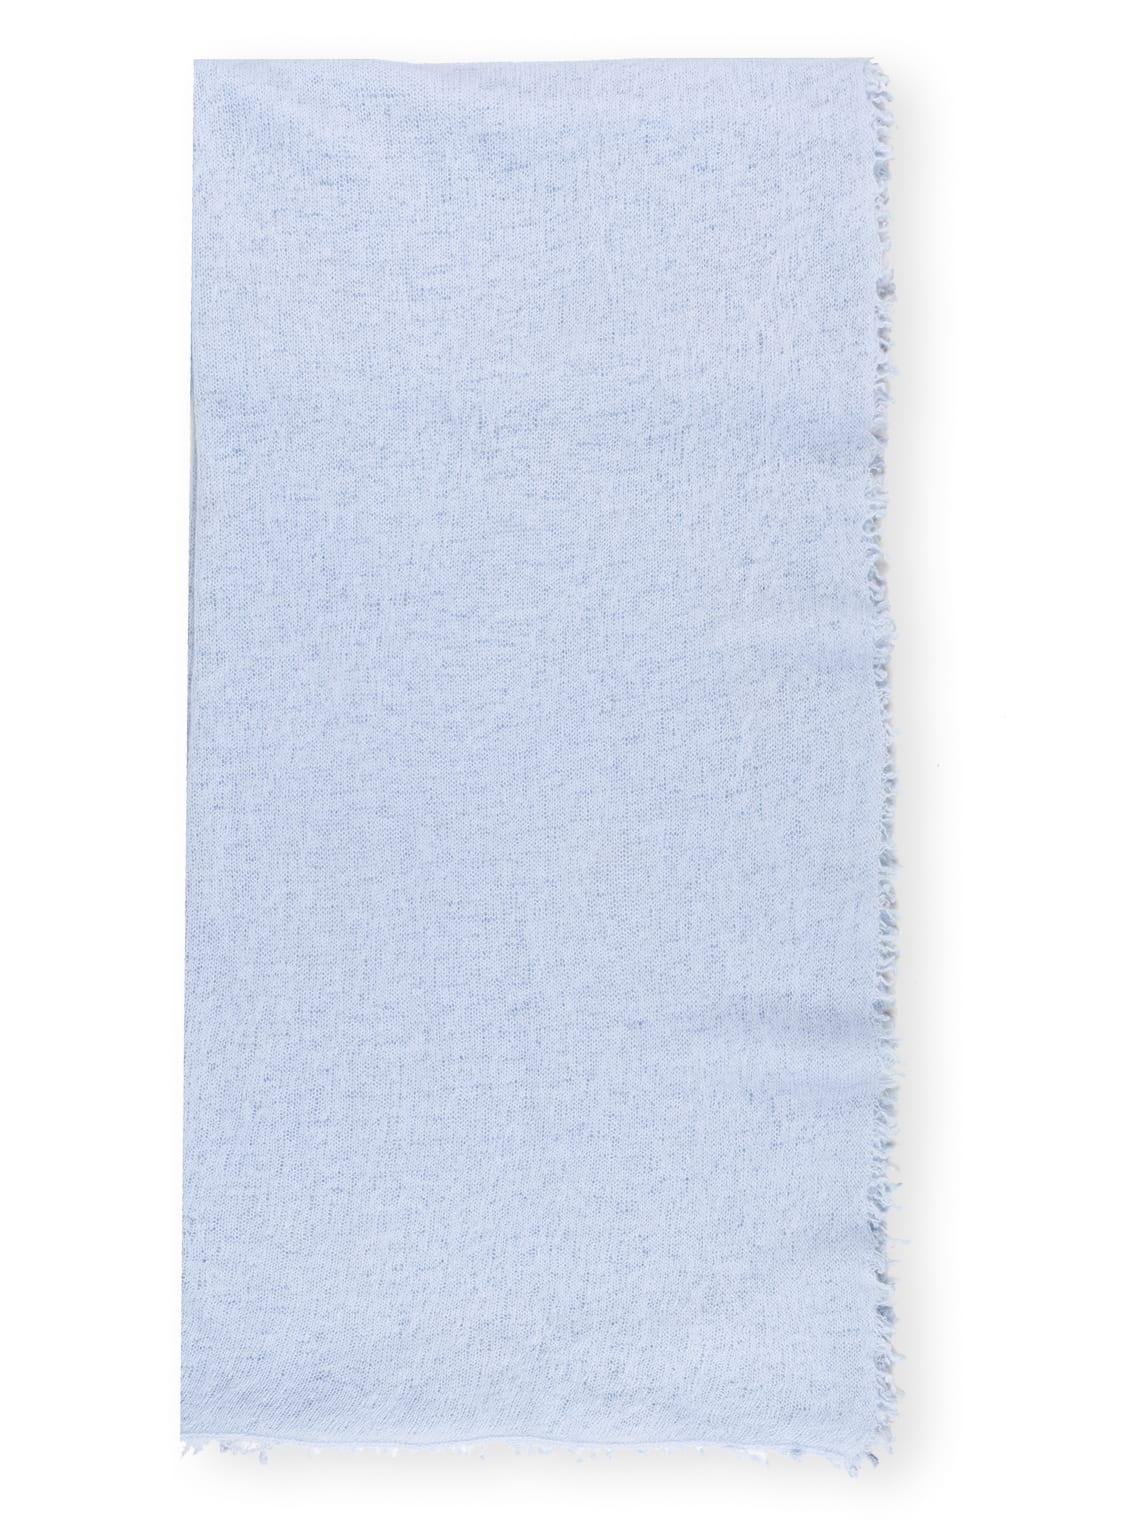 Image of Bakaree Cashmere-Schal blau